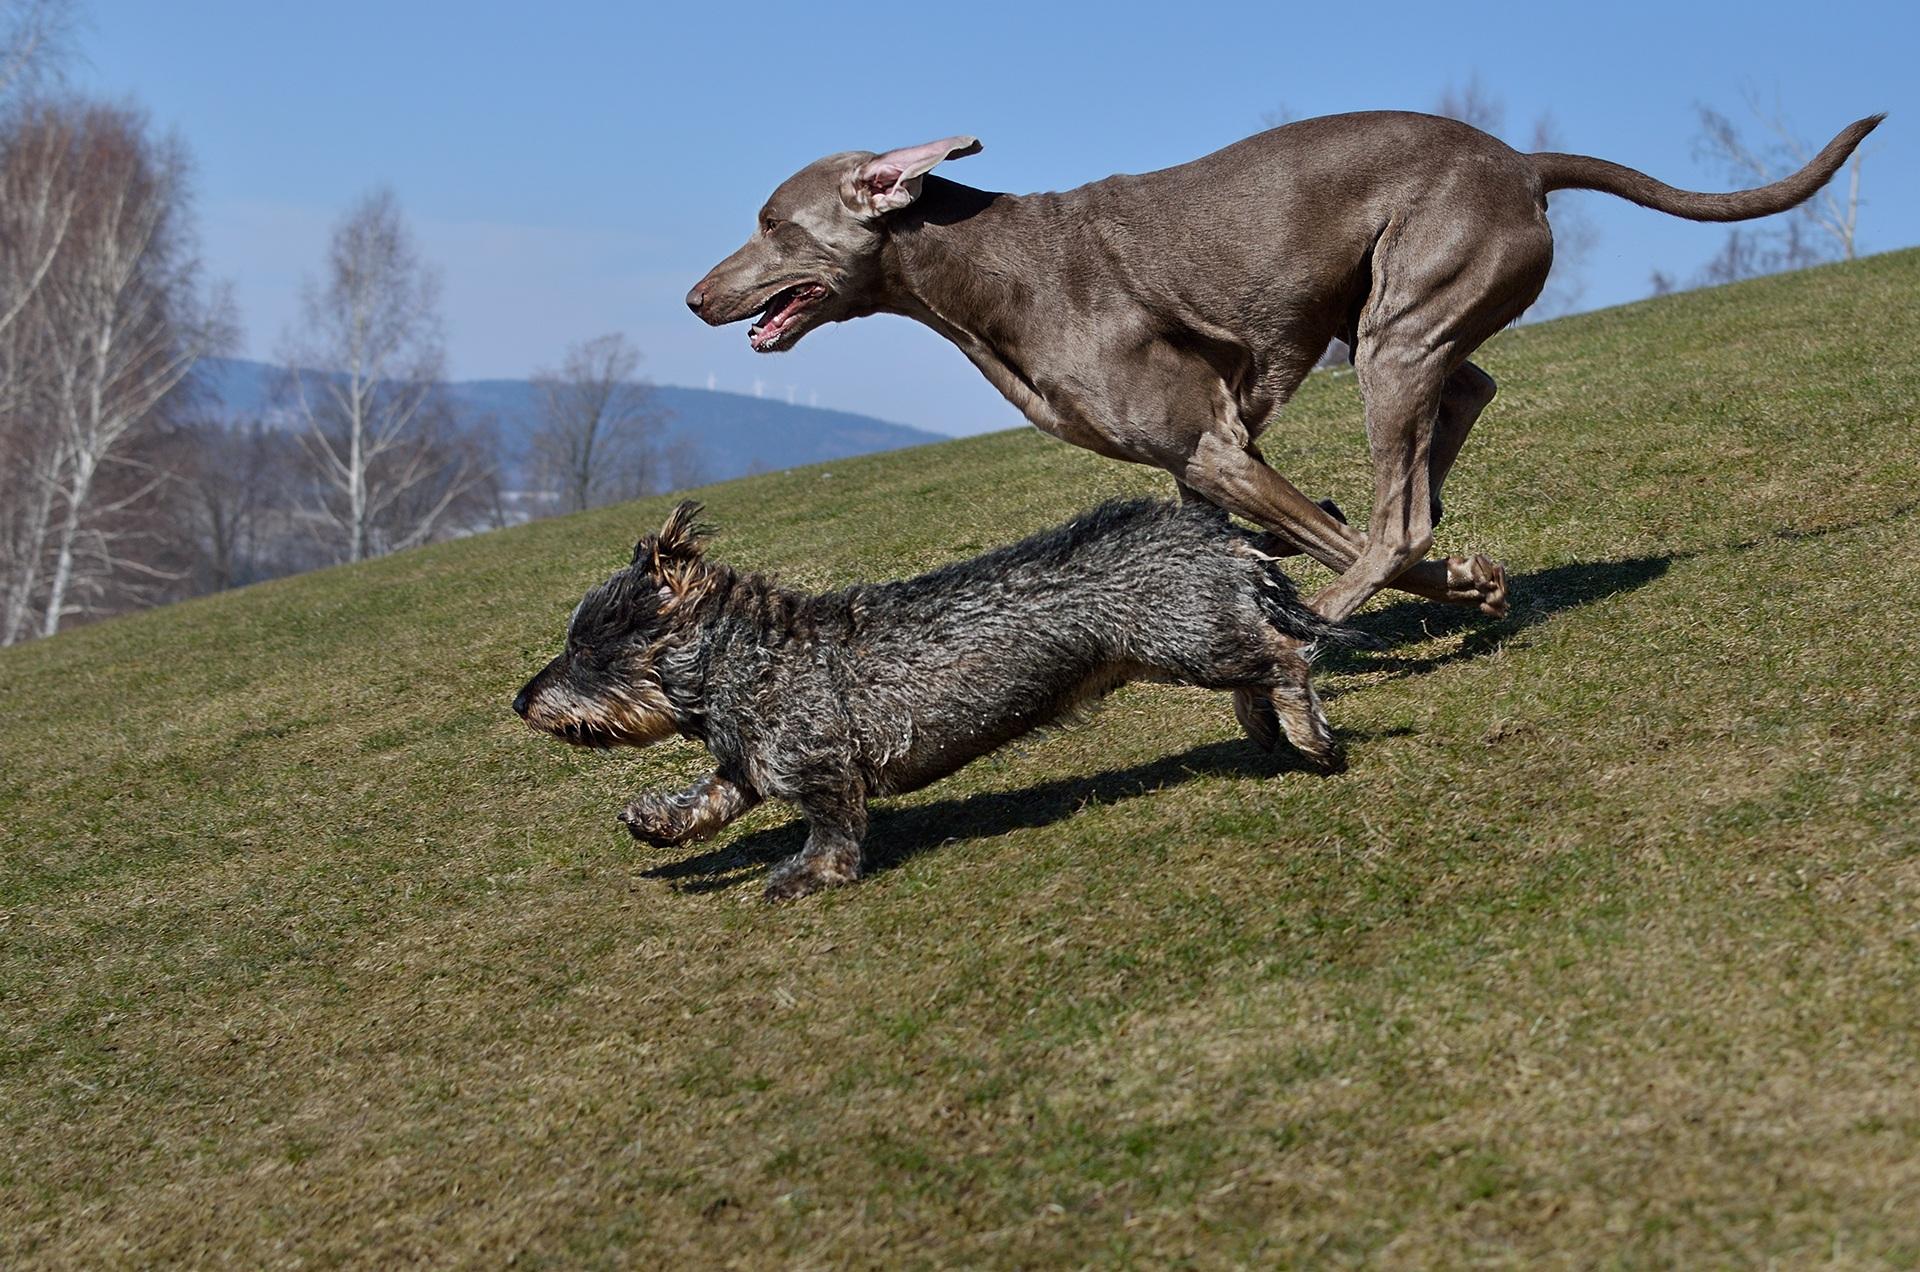 free images grass weimaraner hunting dog dog breed dachshund